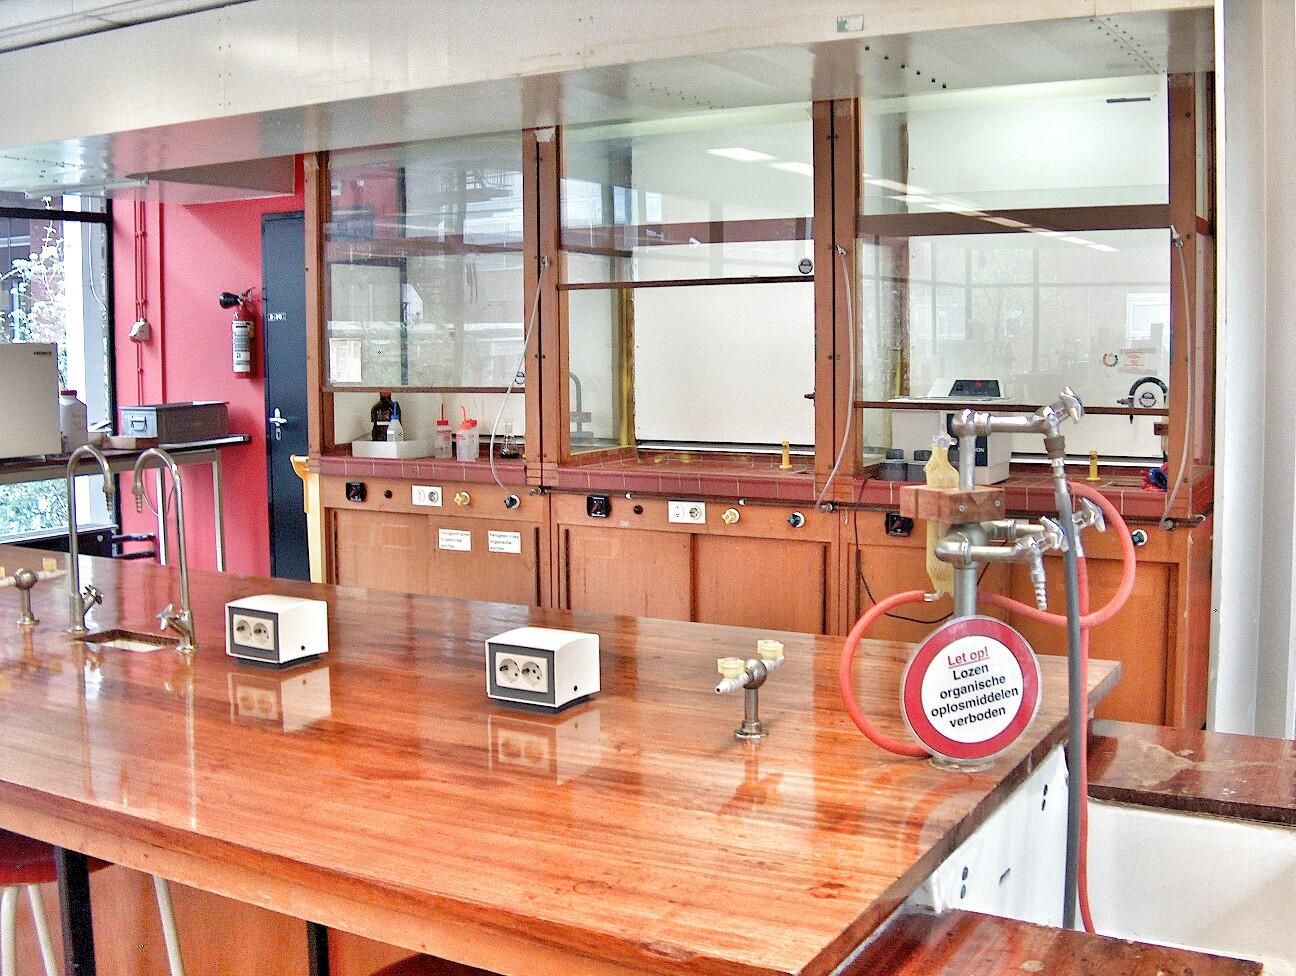 Life Science & Chemistry